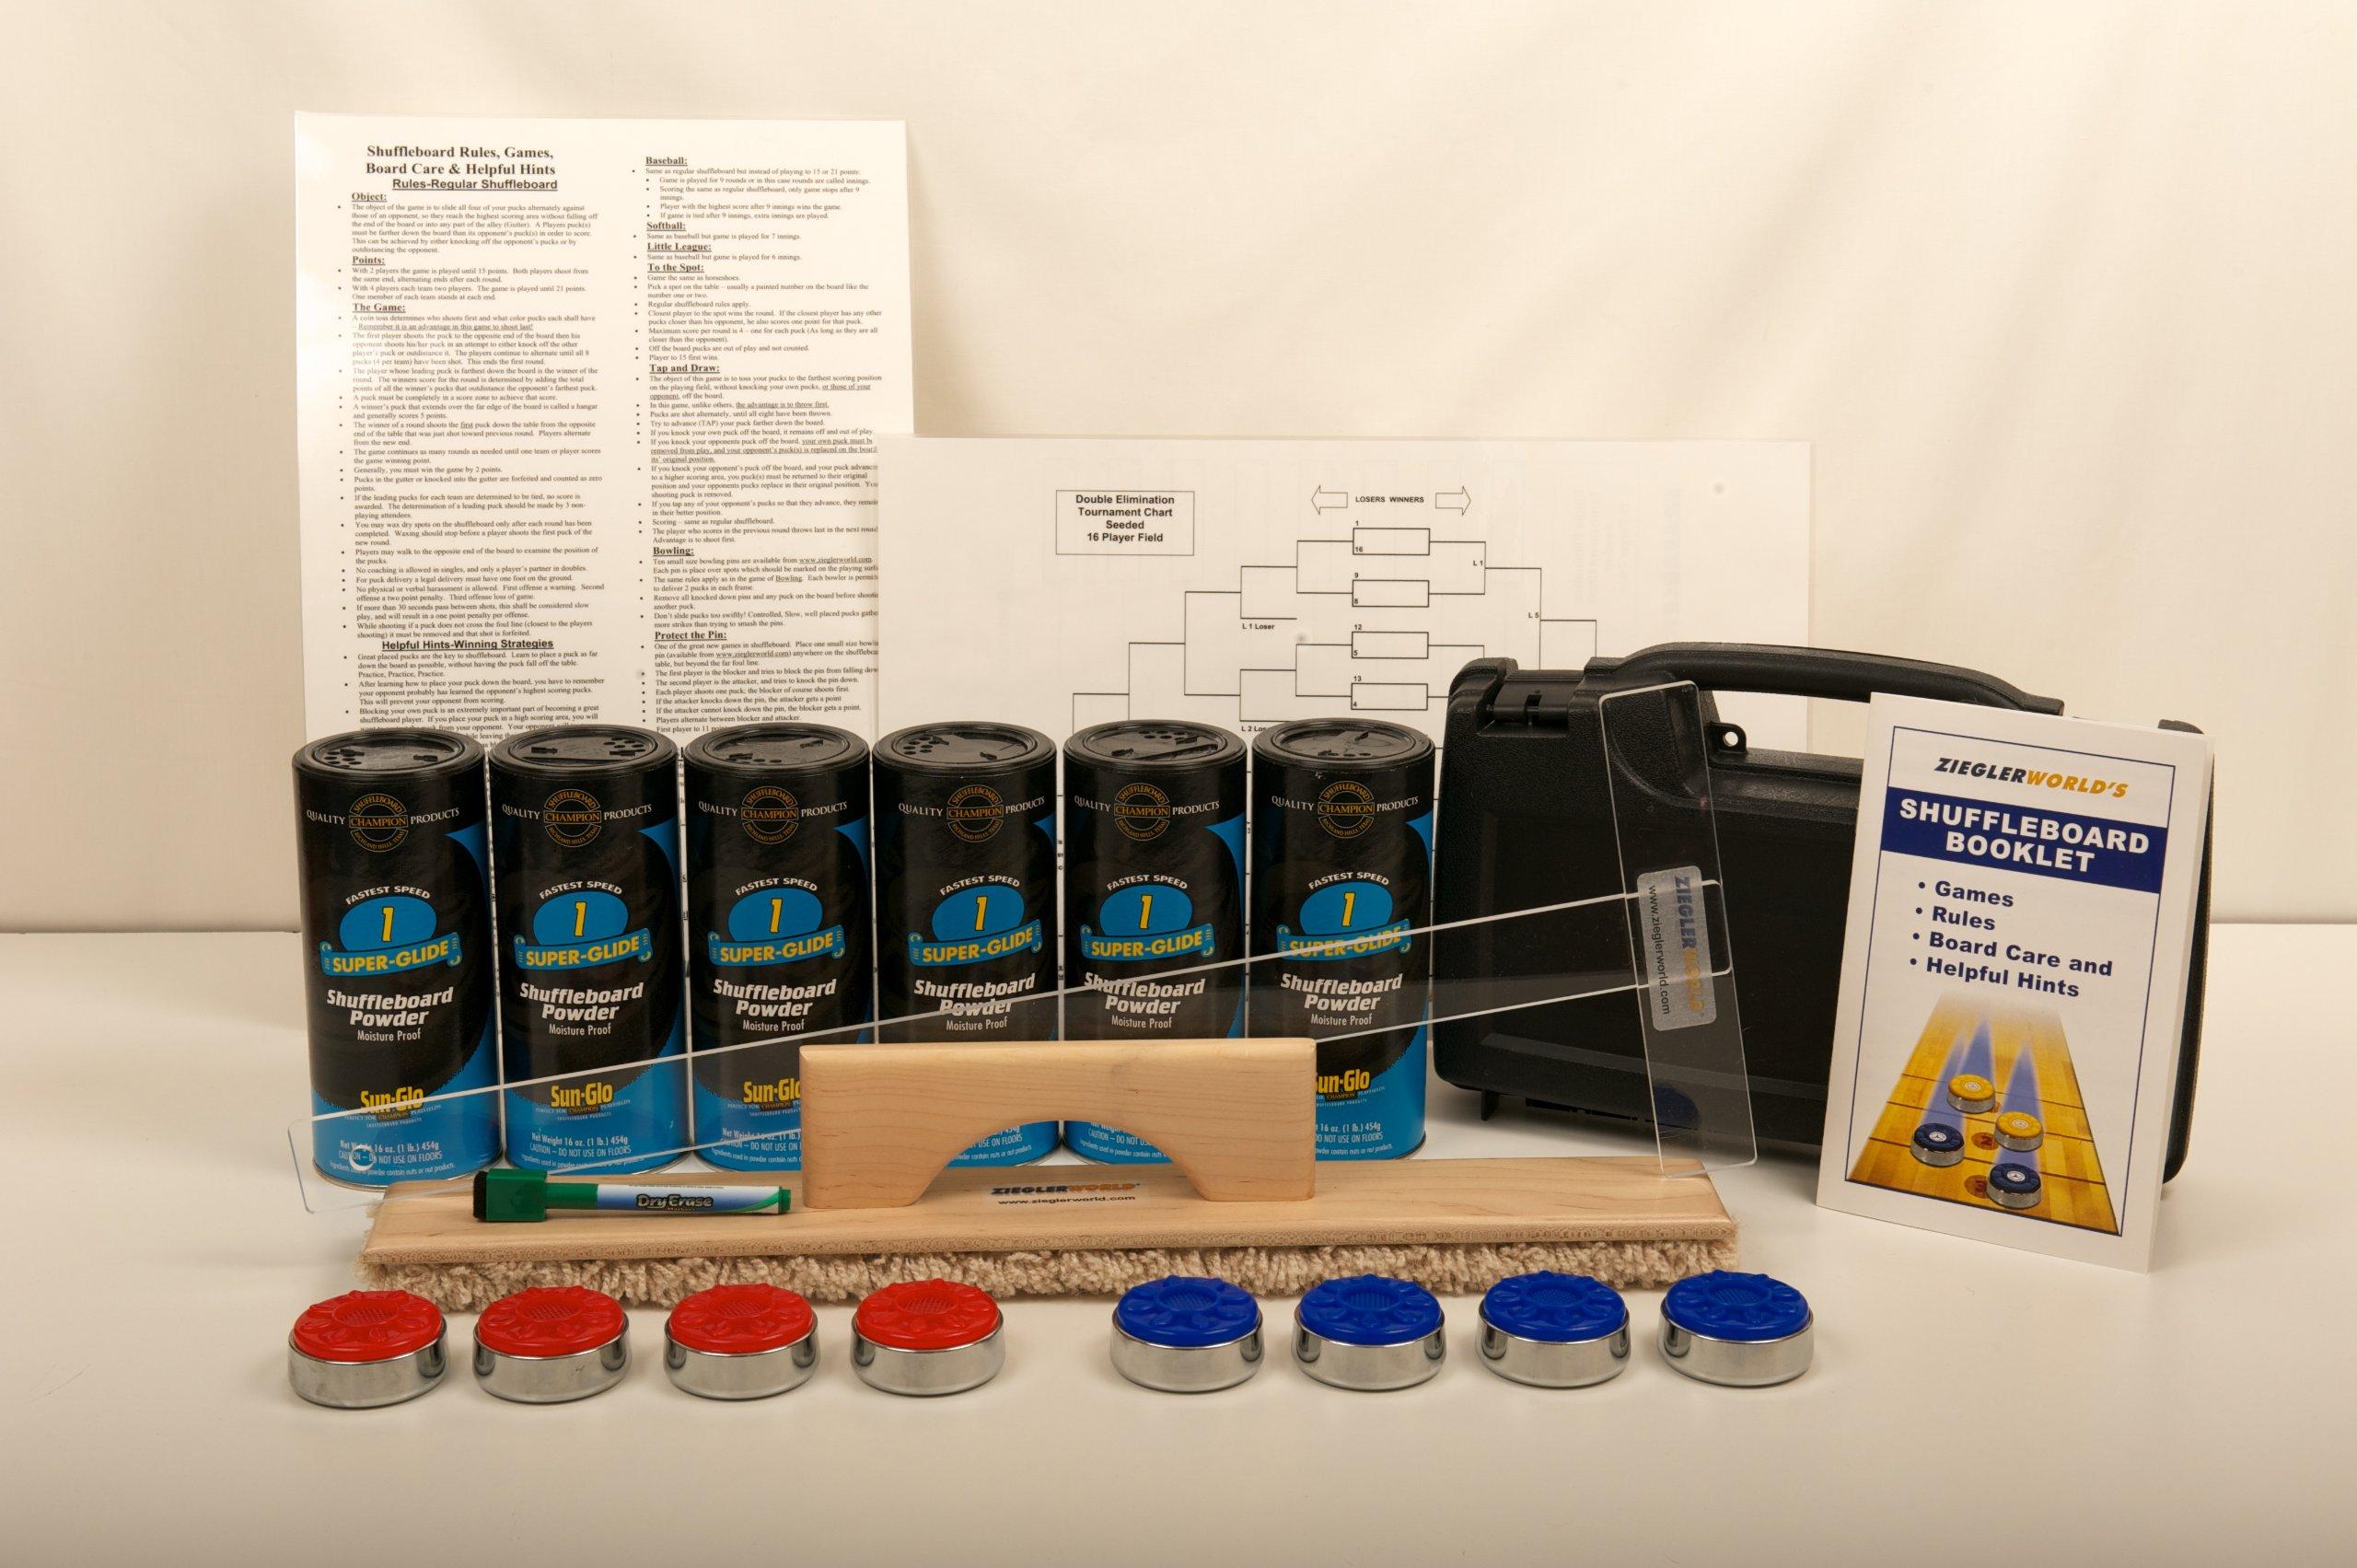 Table Shuffleboard Pucks Weights Starter Kit Package Deal!